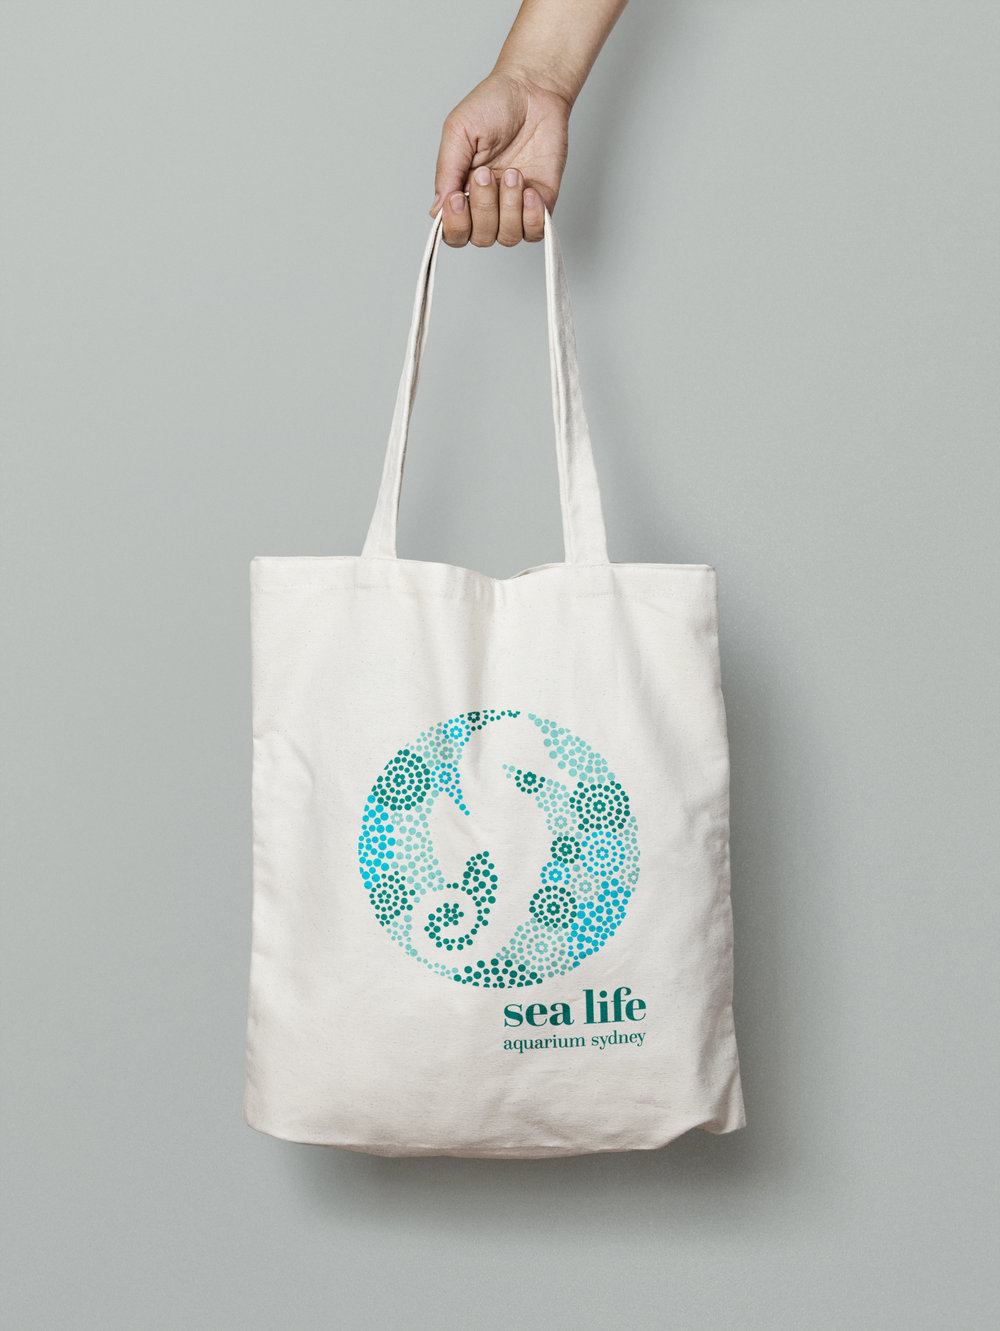 sea life tote.jpg